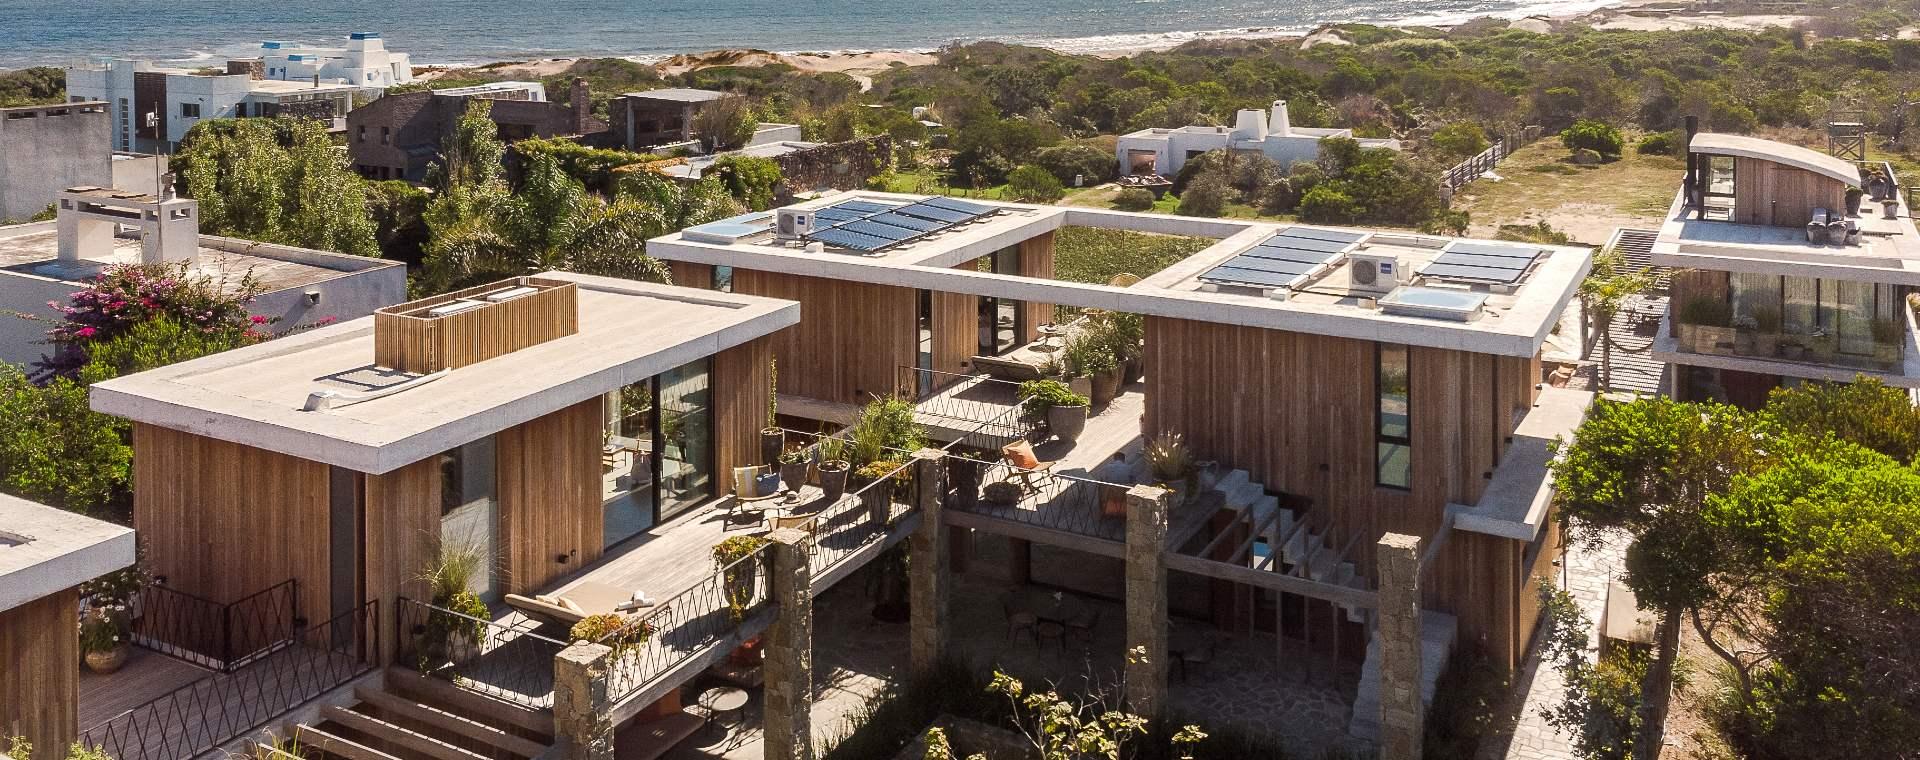 Posada Ayana, Uruguay | Plan South America